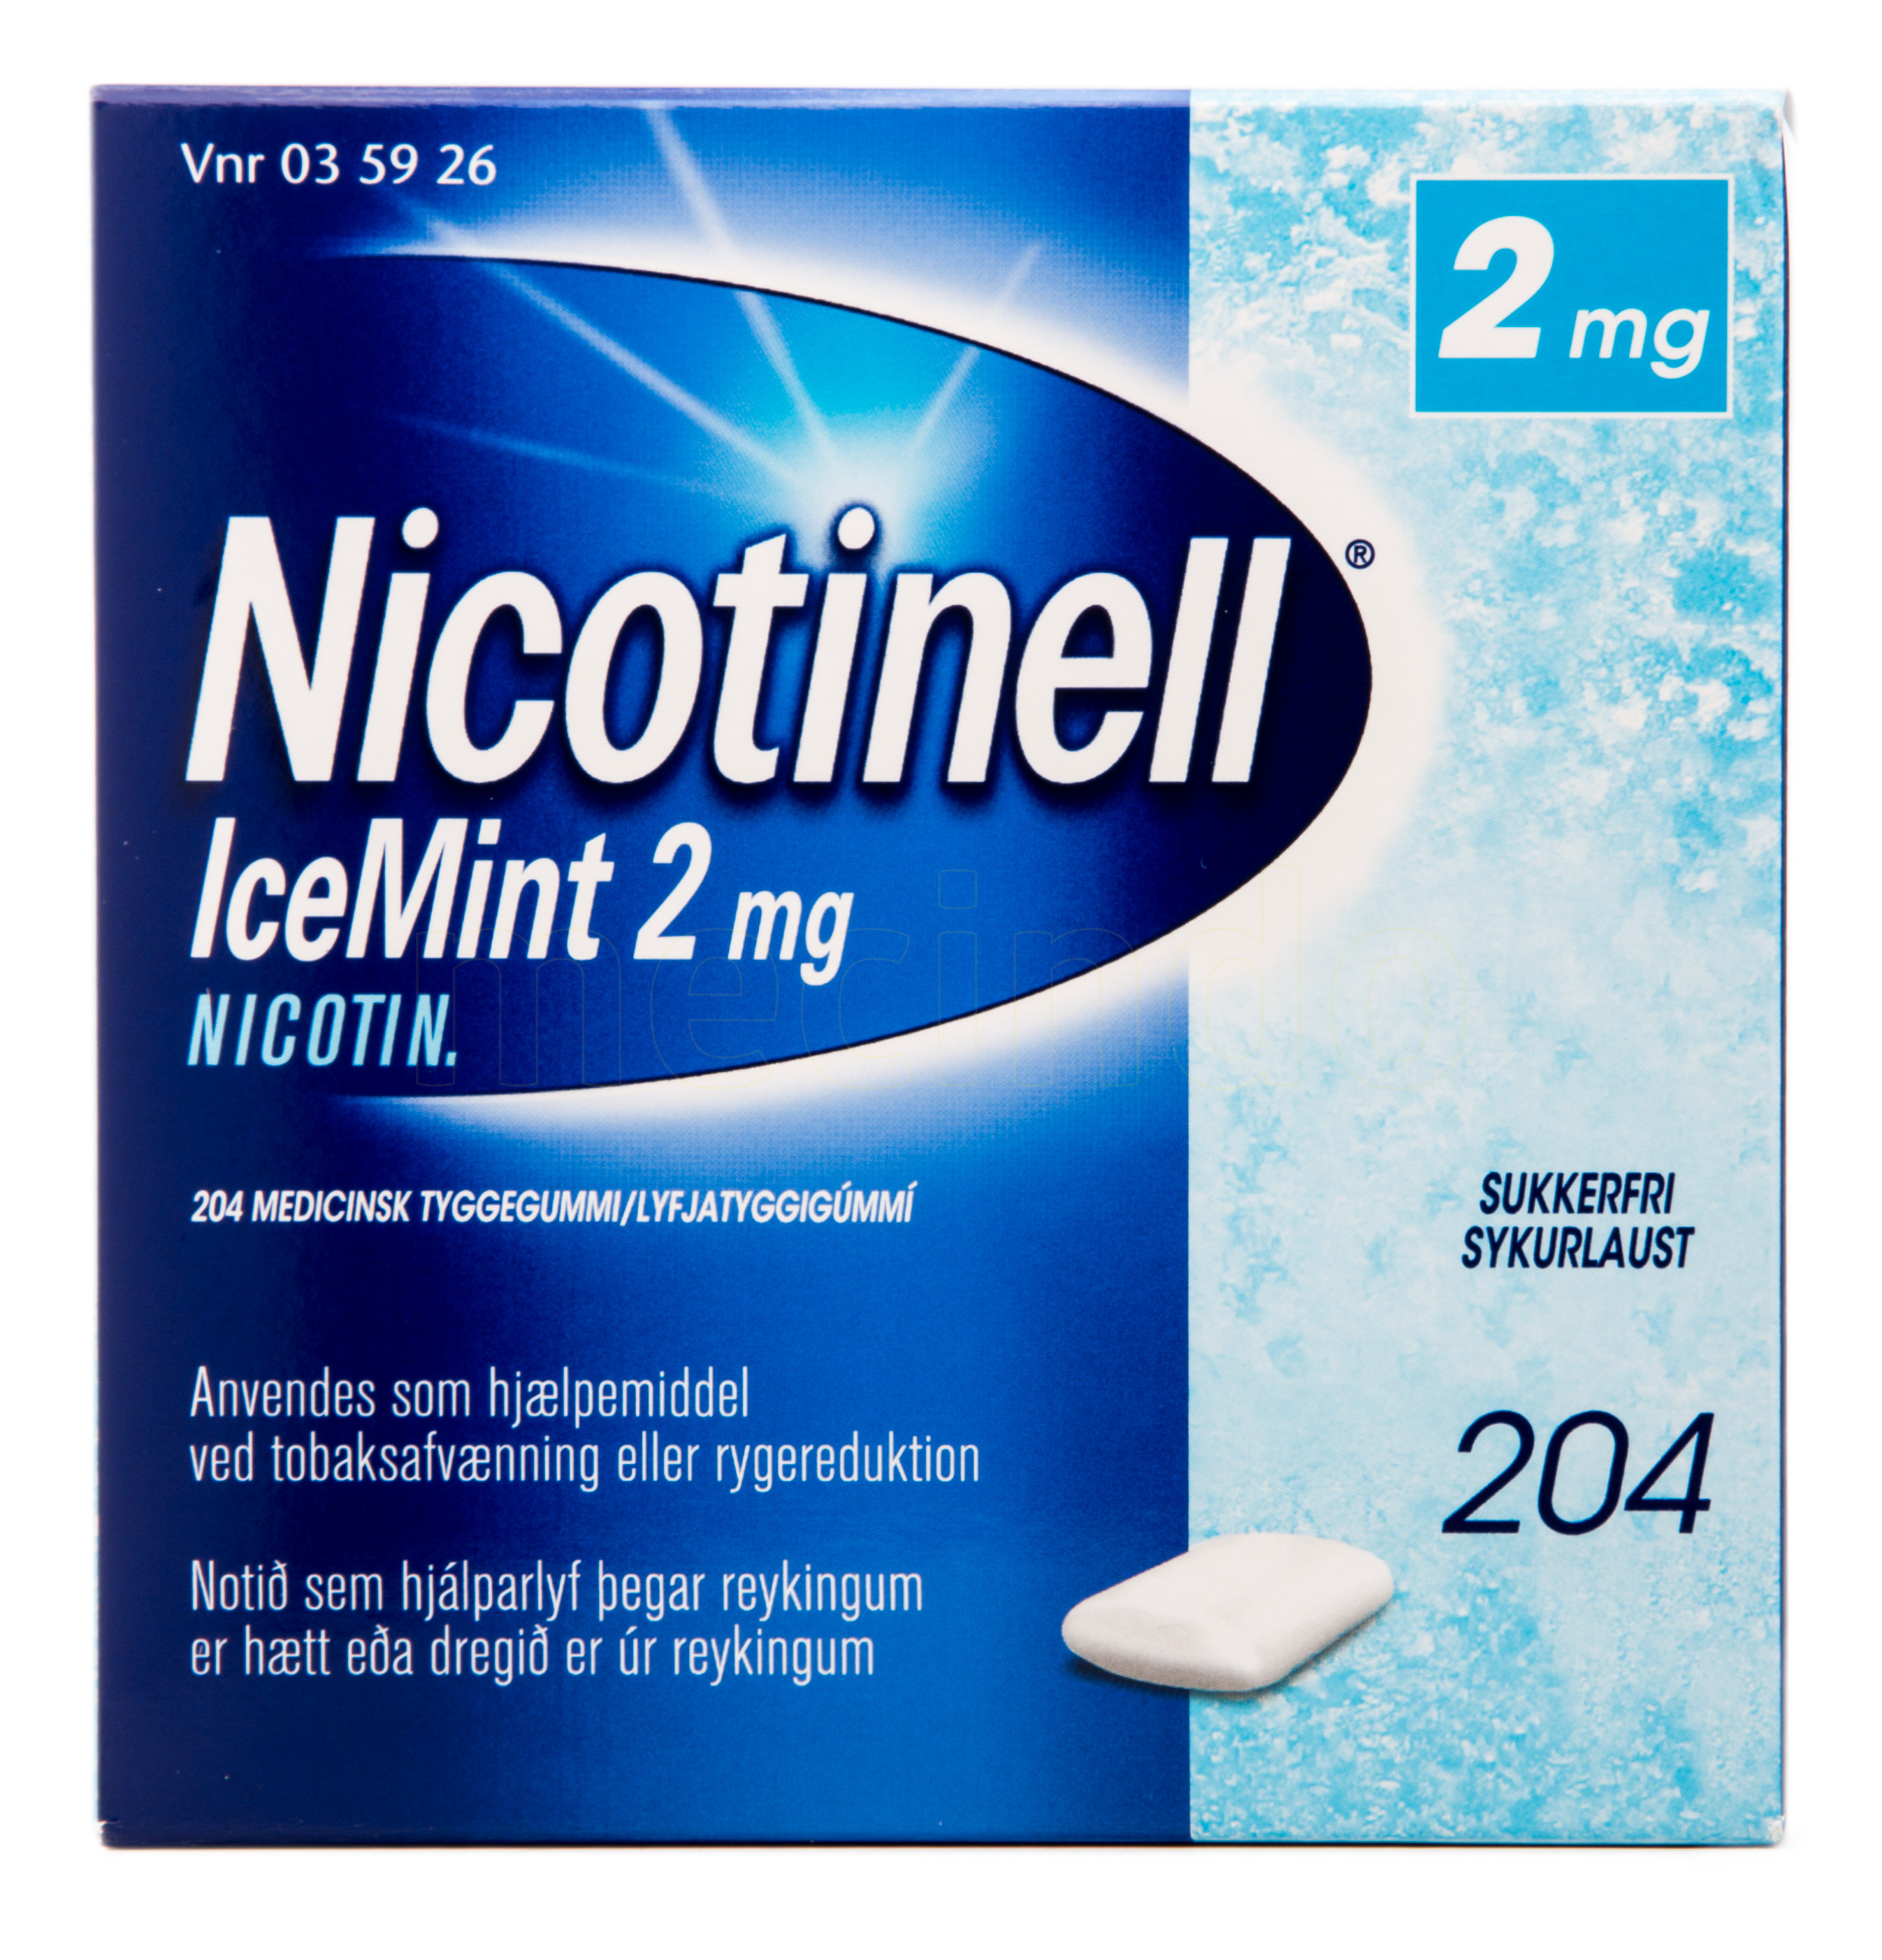 Billede af Nicotinell Tyggegummi IceMint - 2 mg - 204 Stk.